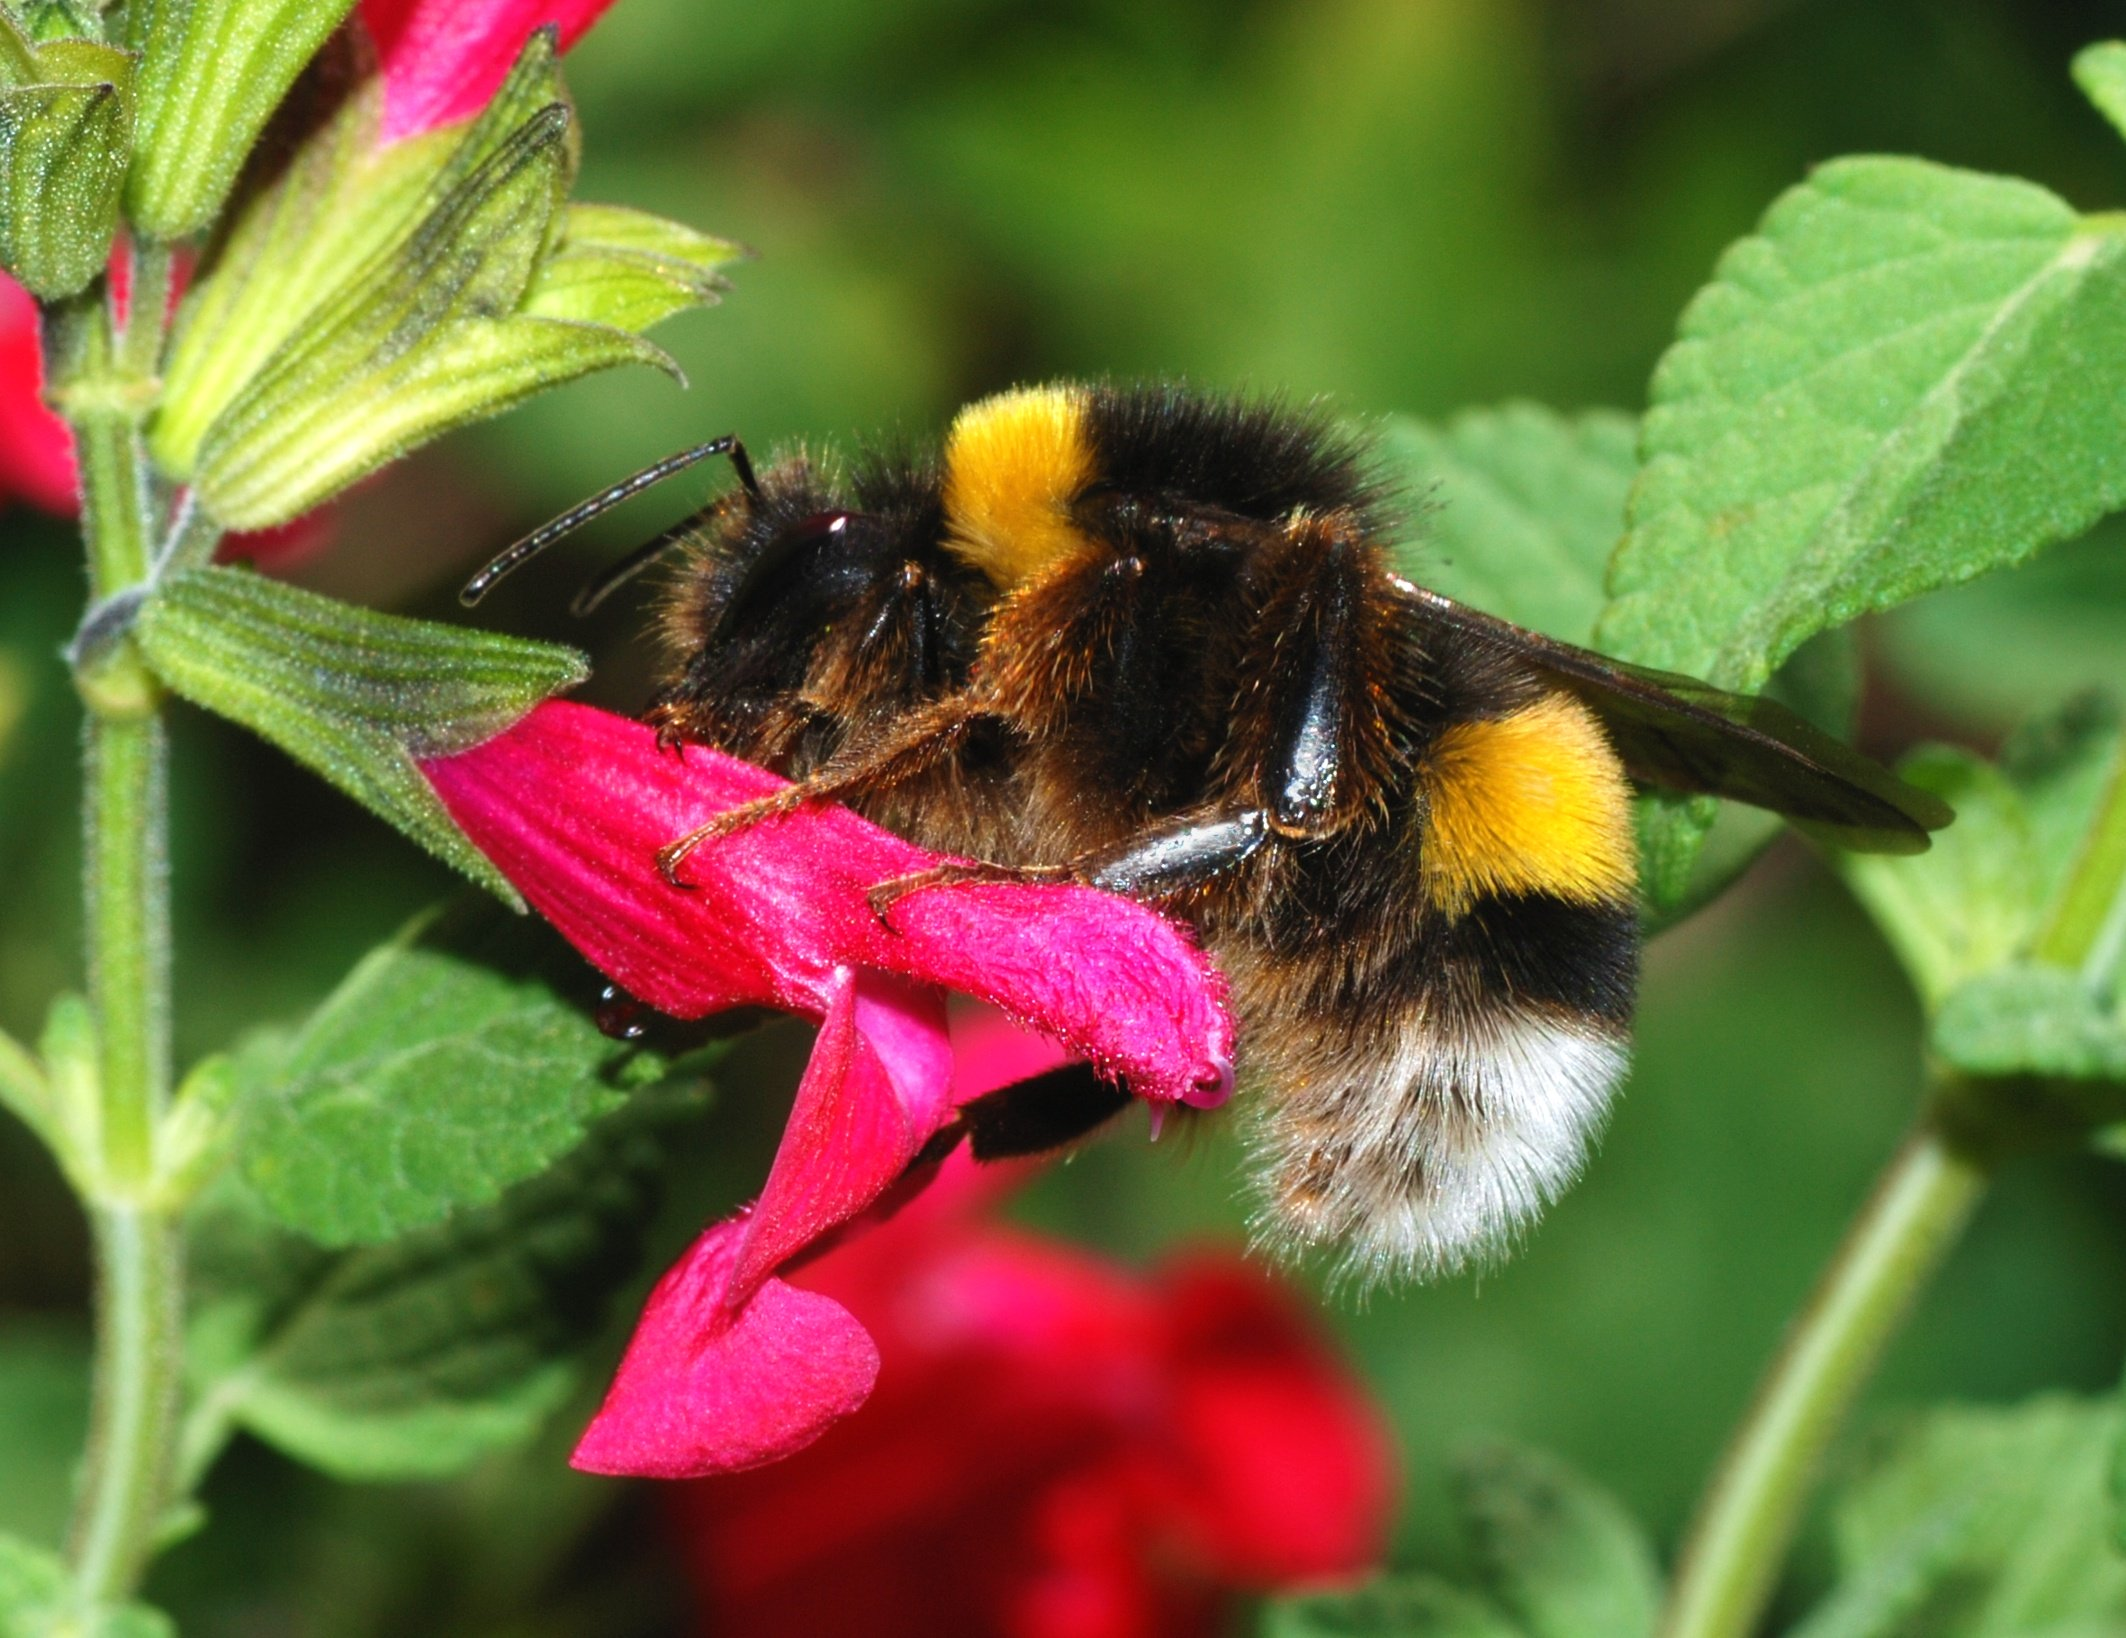 A male Bombus terrestris bumblebee